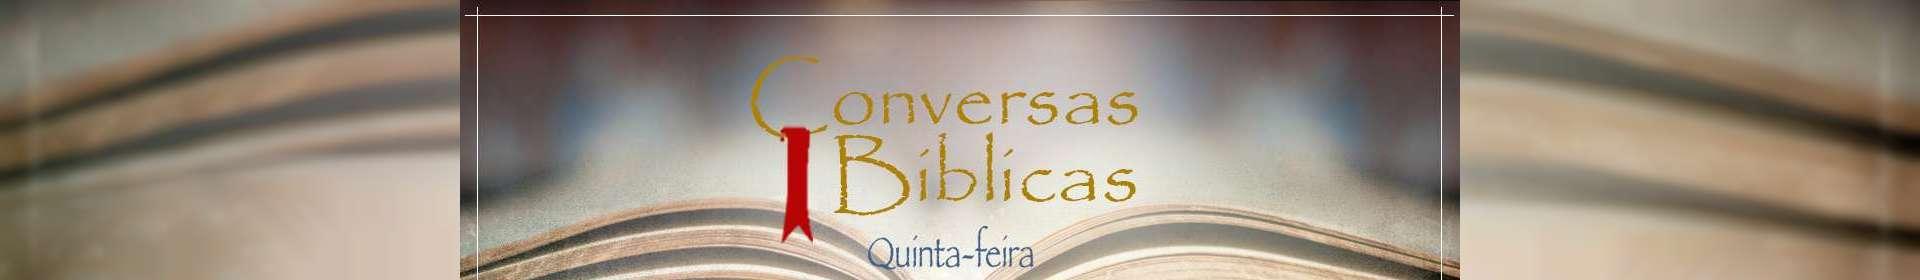 Conversas Bíblicas: Doutrina de corpo - Parte 2